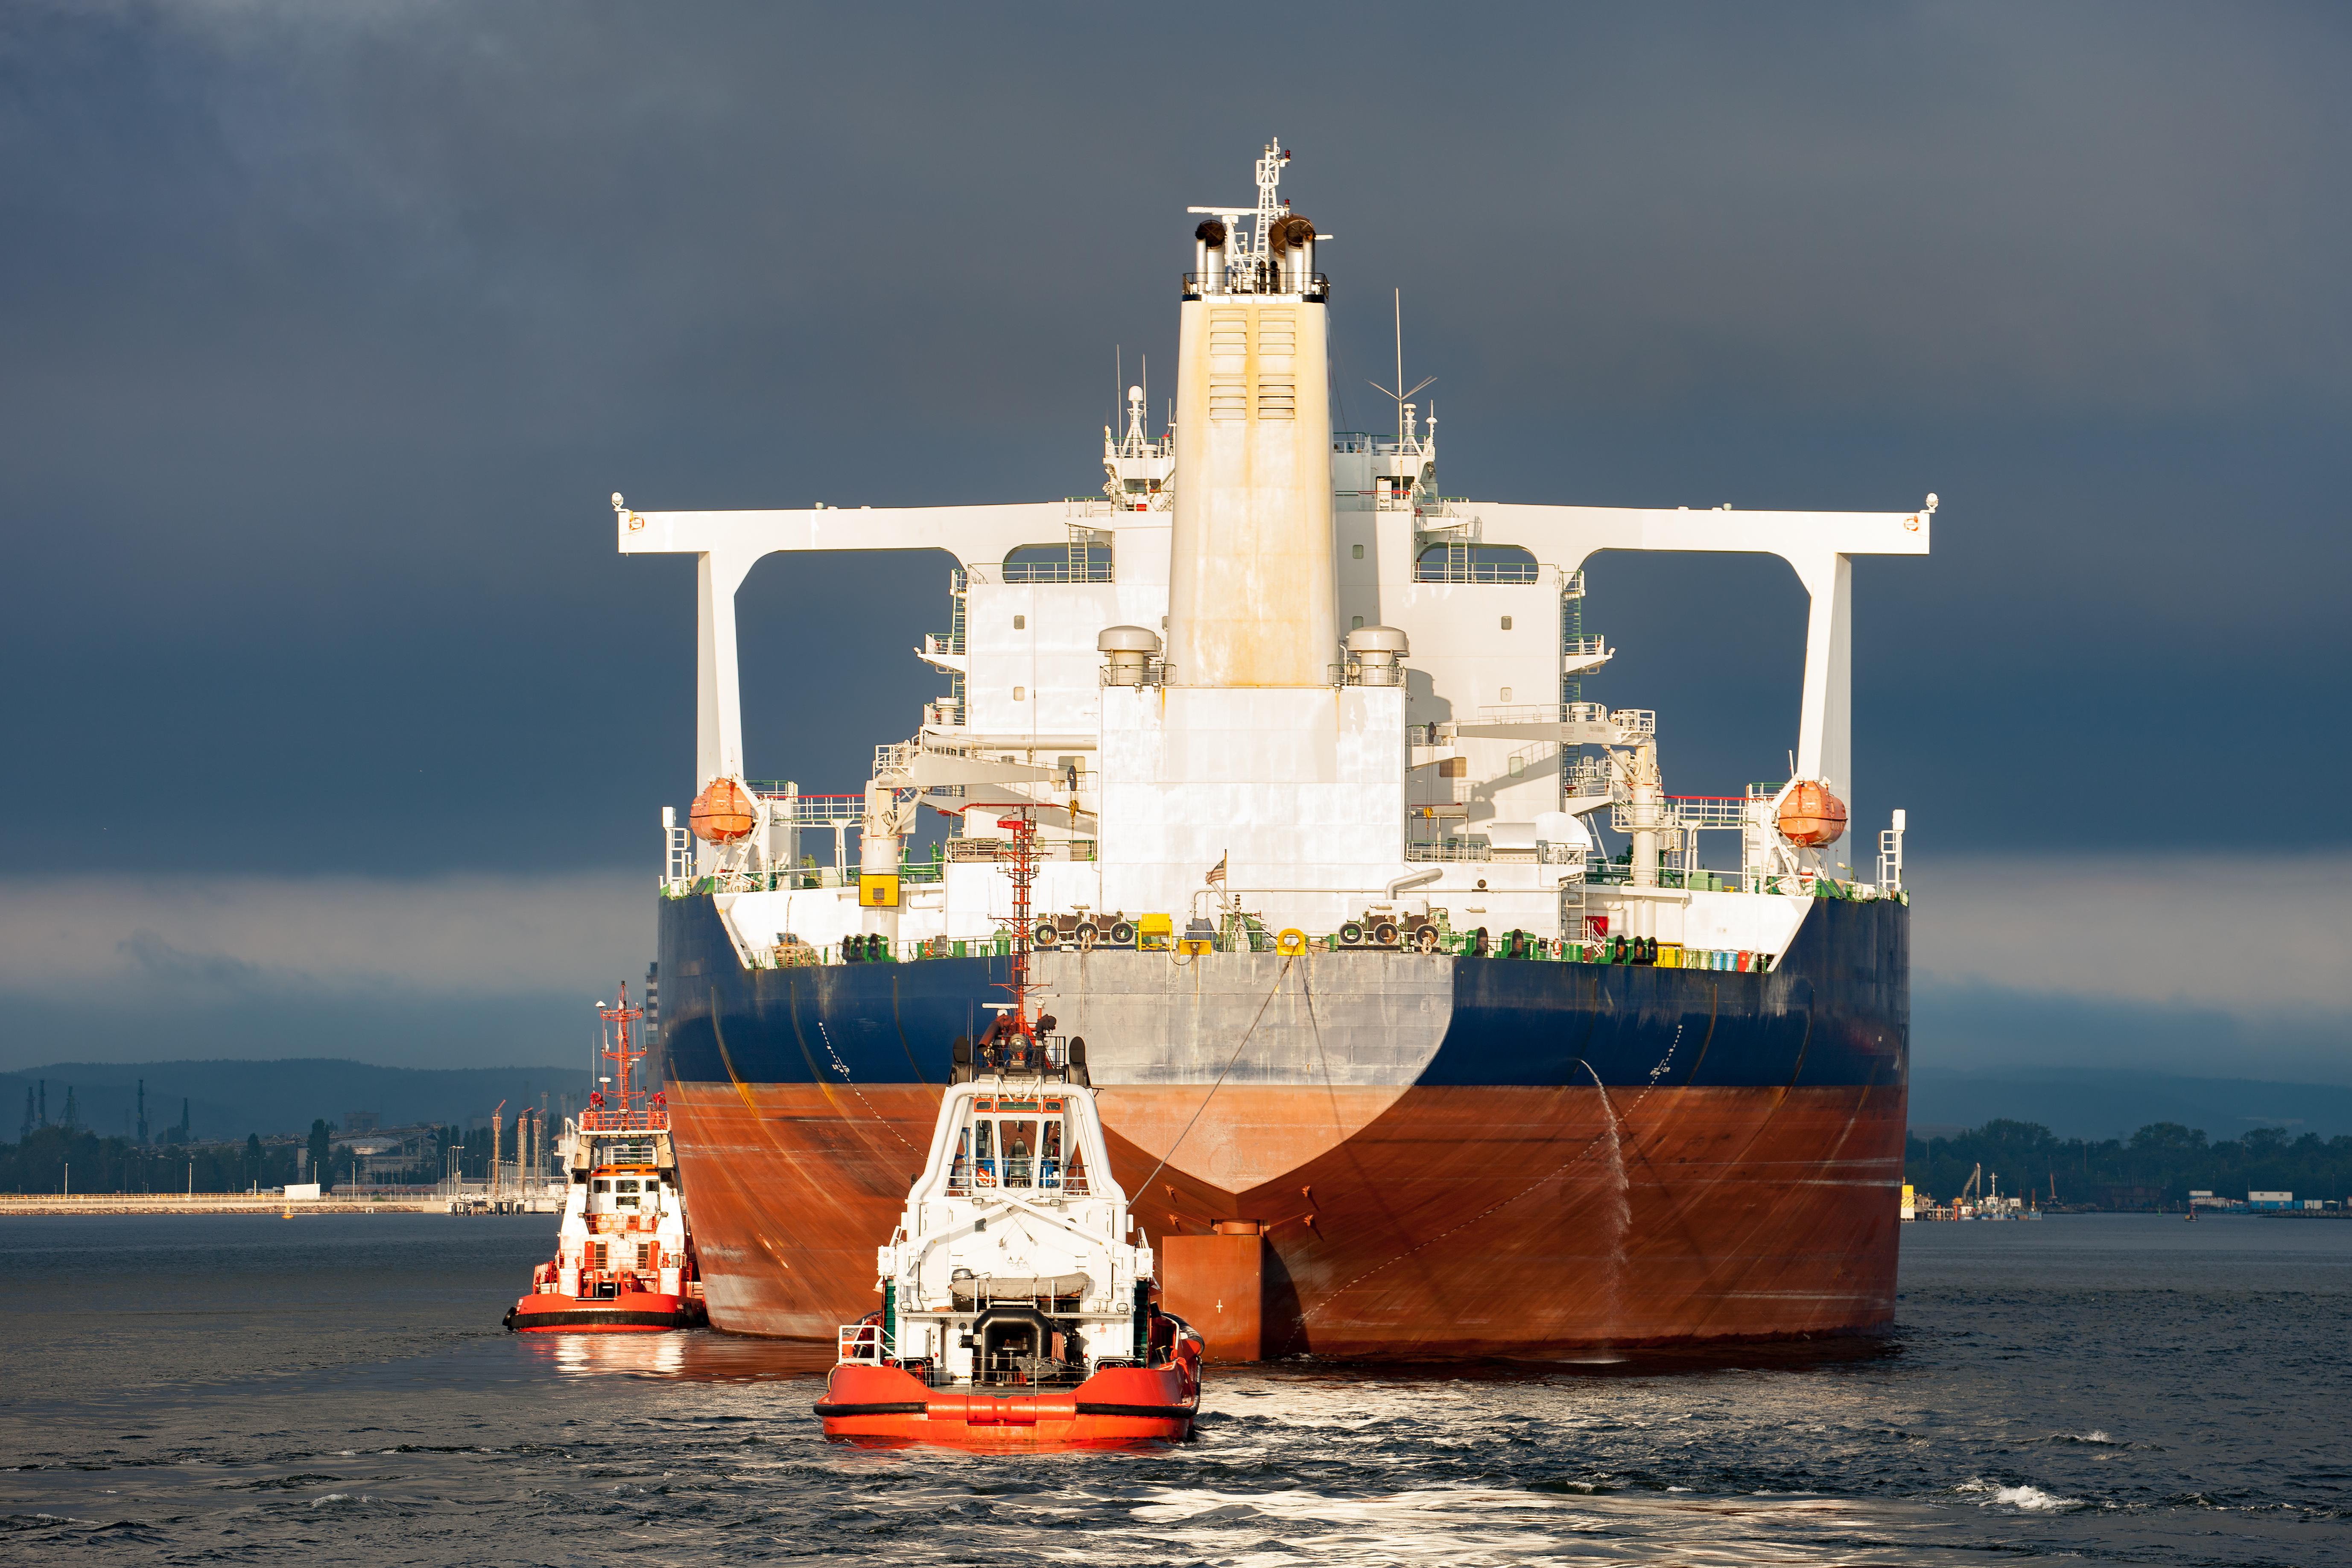 tugboat bringing ocean liner through canal